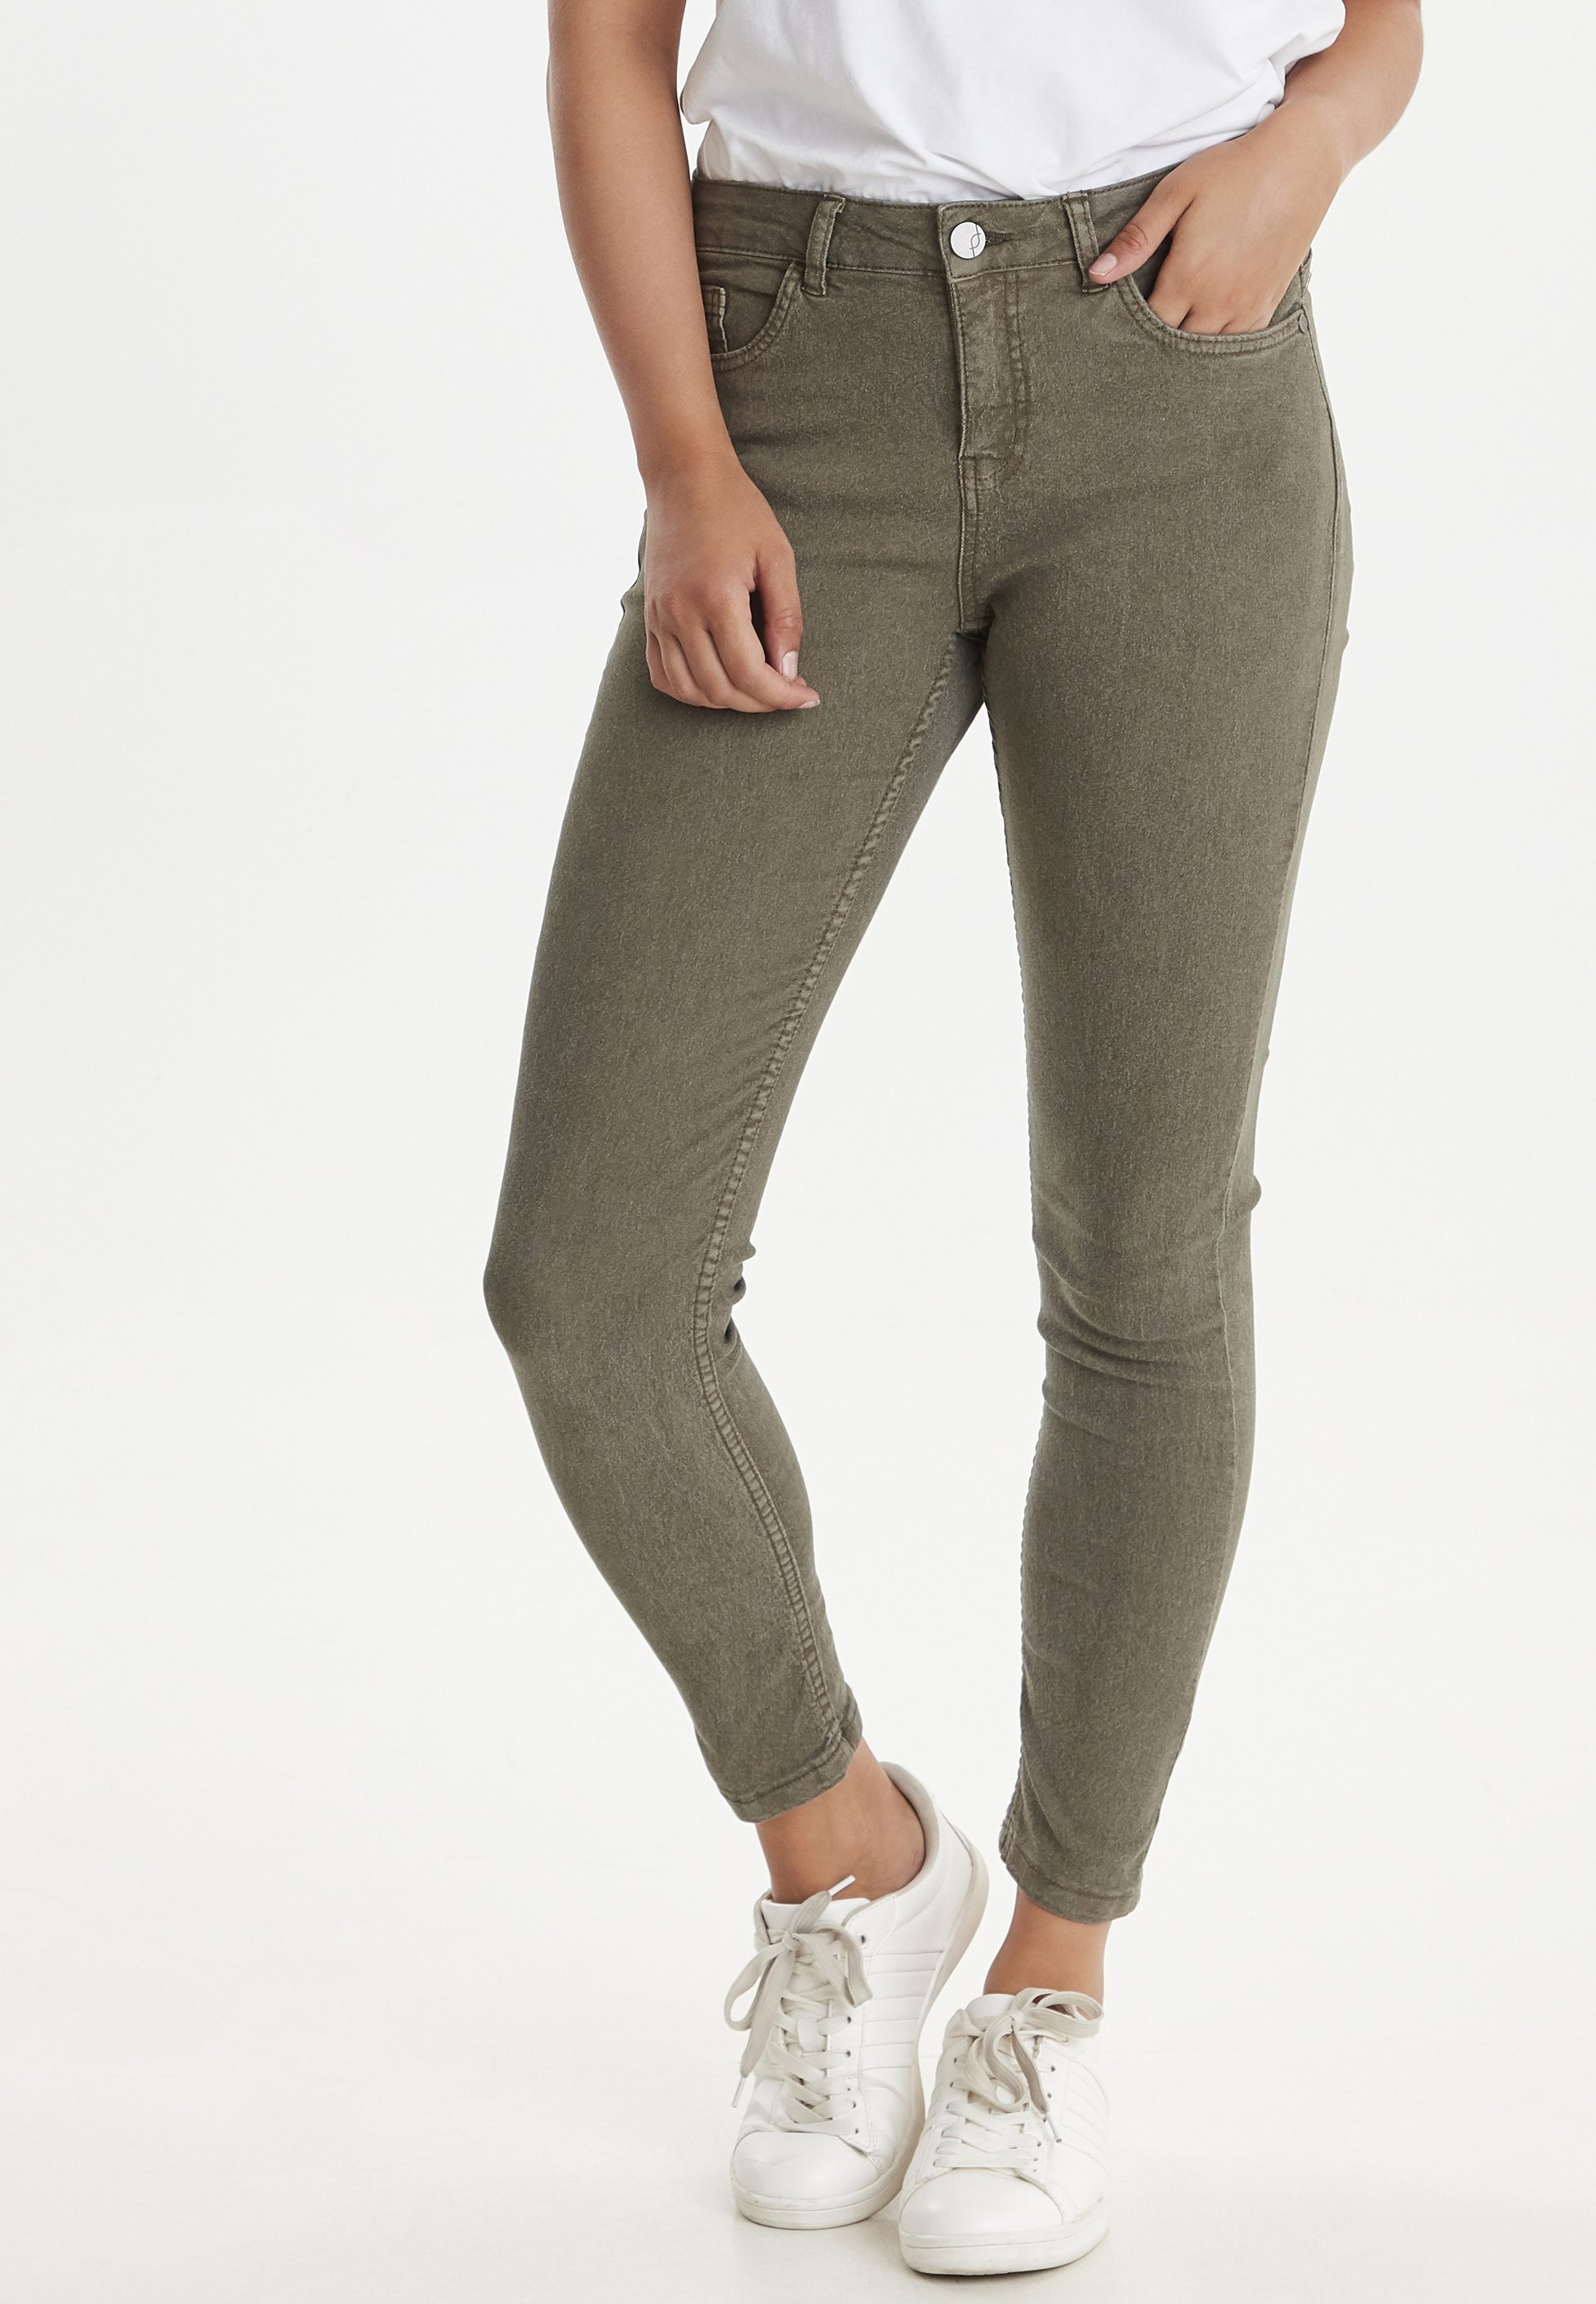 Fransa Frcayellow- Jeans Skinny Fit Hedge kJy0hT5A